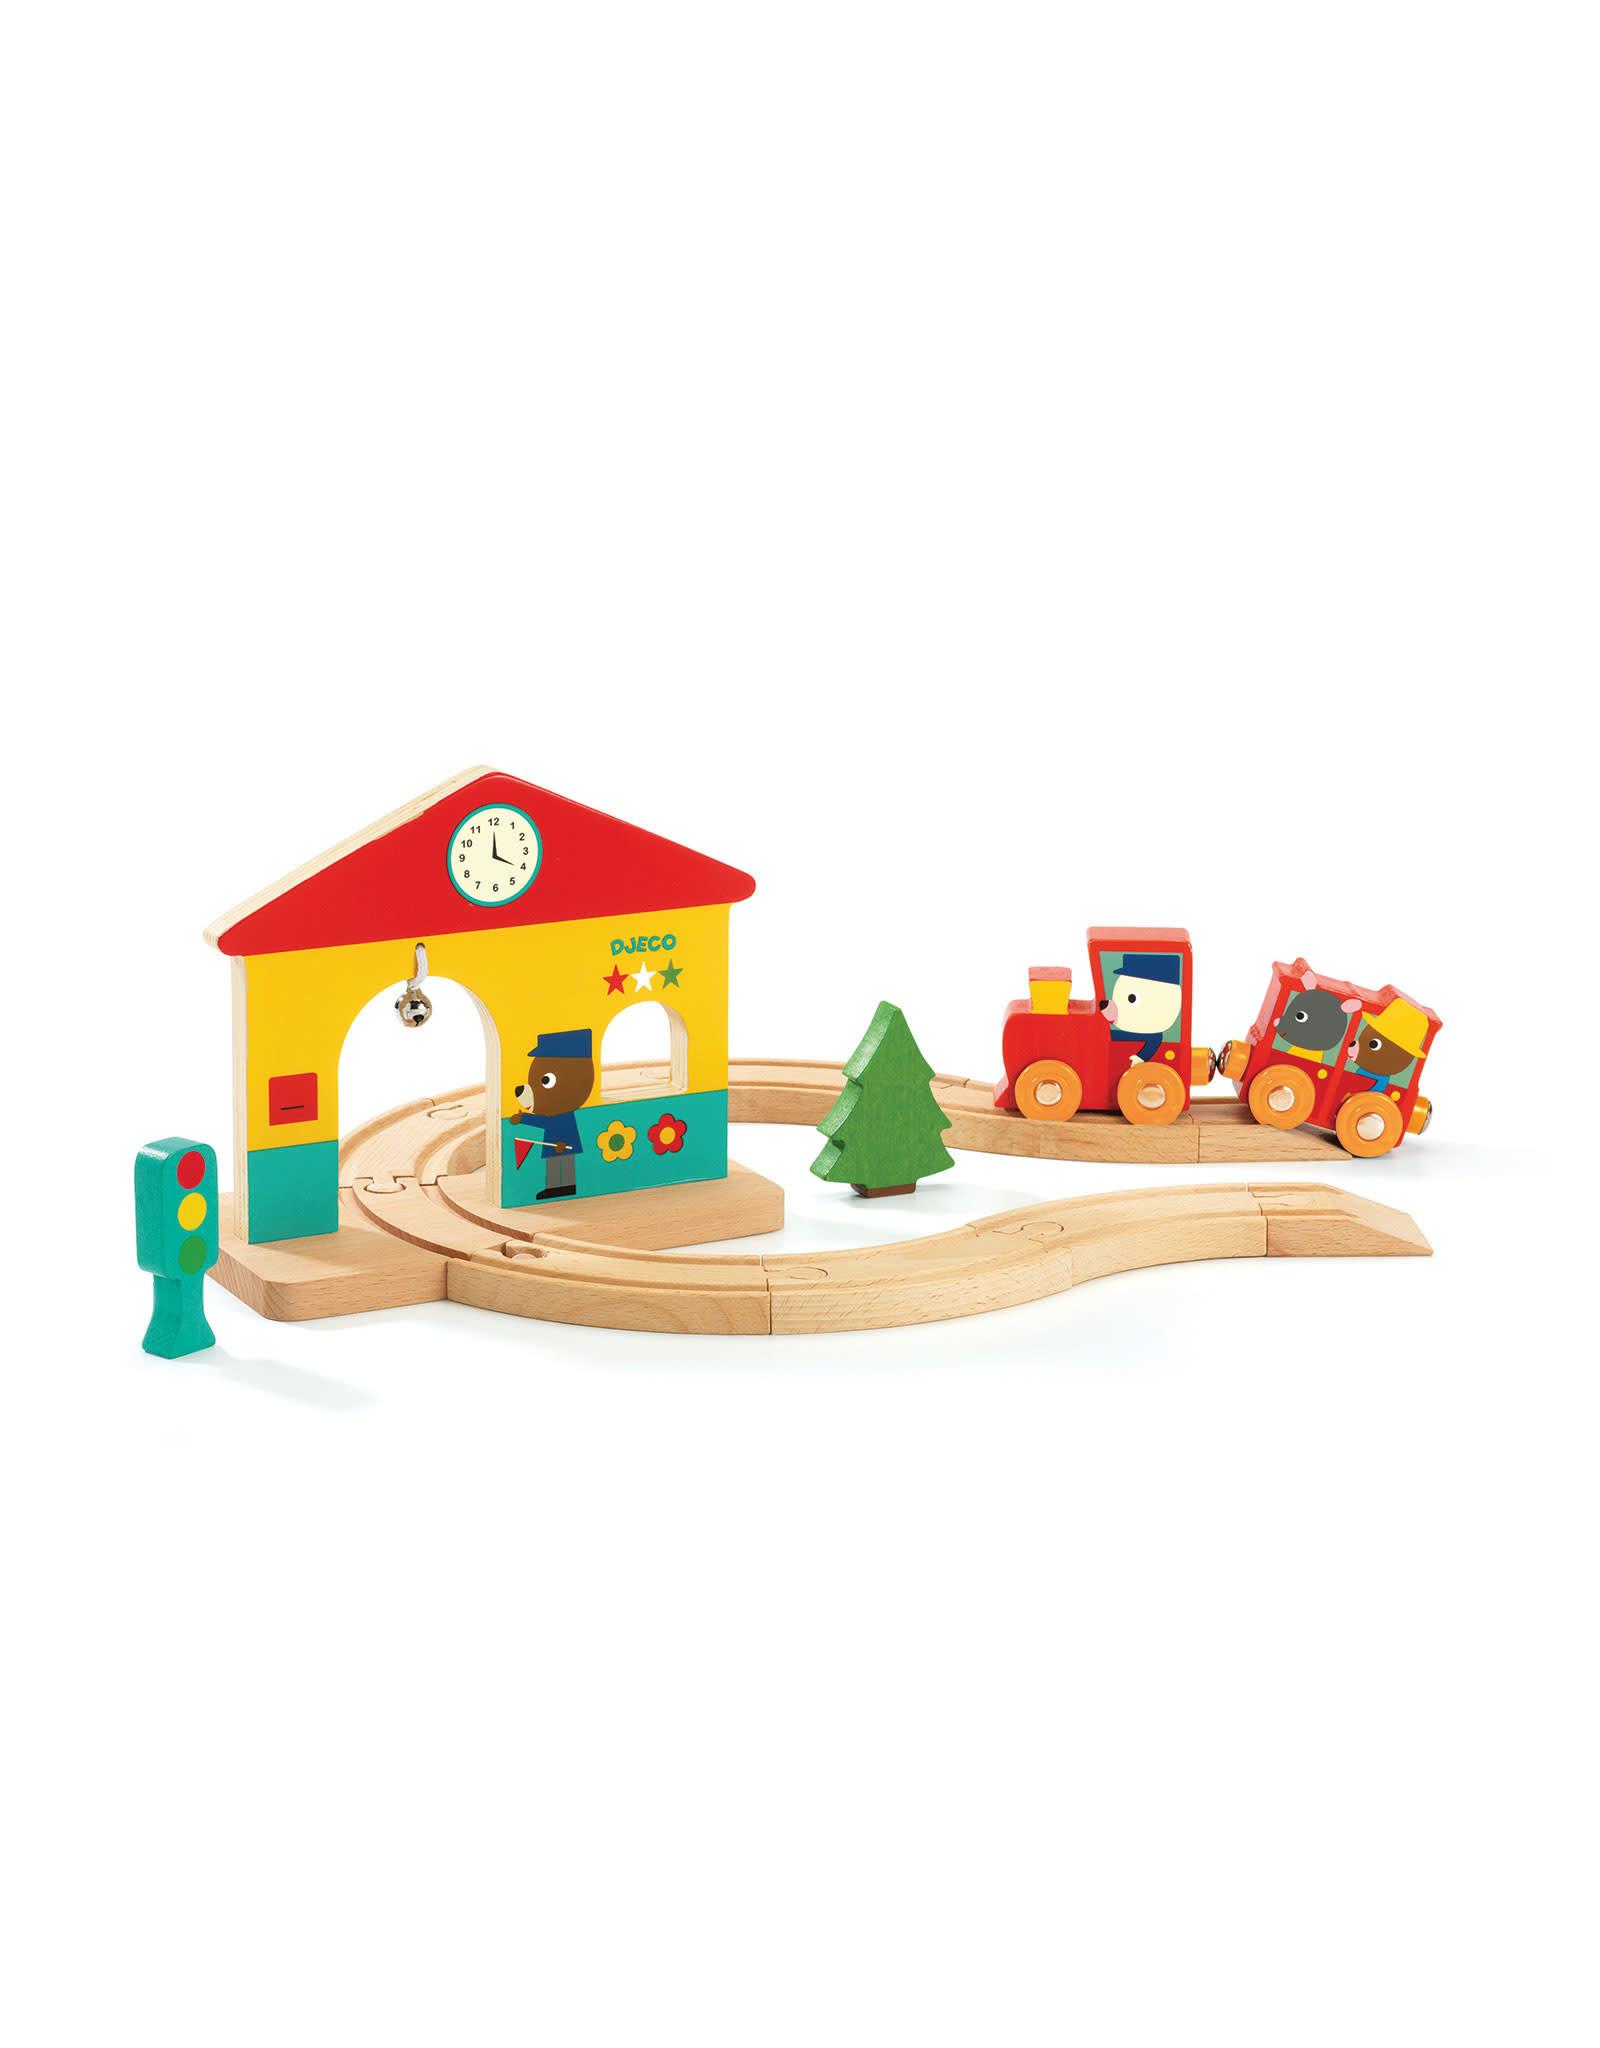 Djeco Wooden Toy - Minitrain Set